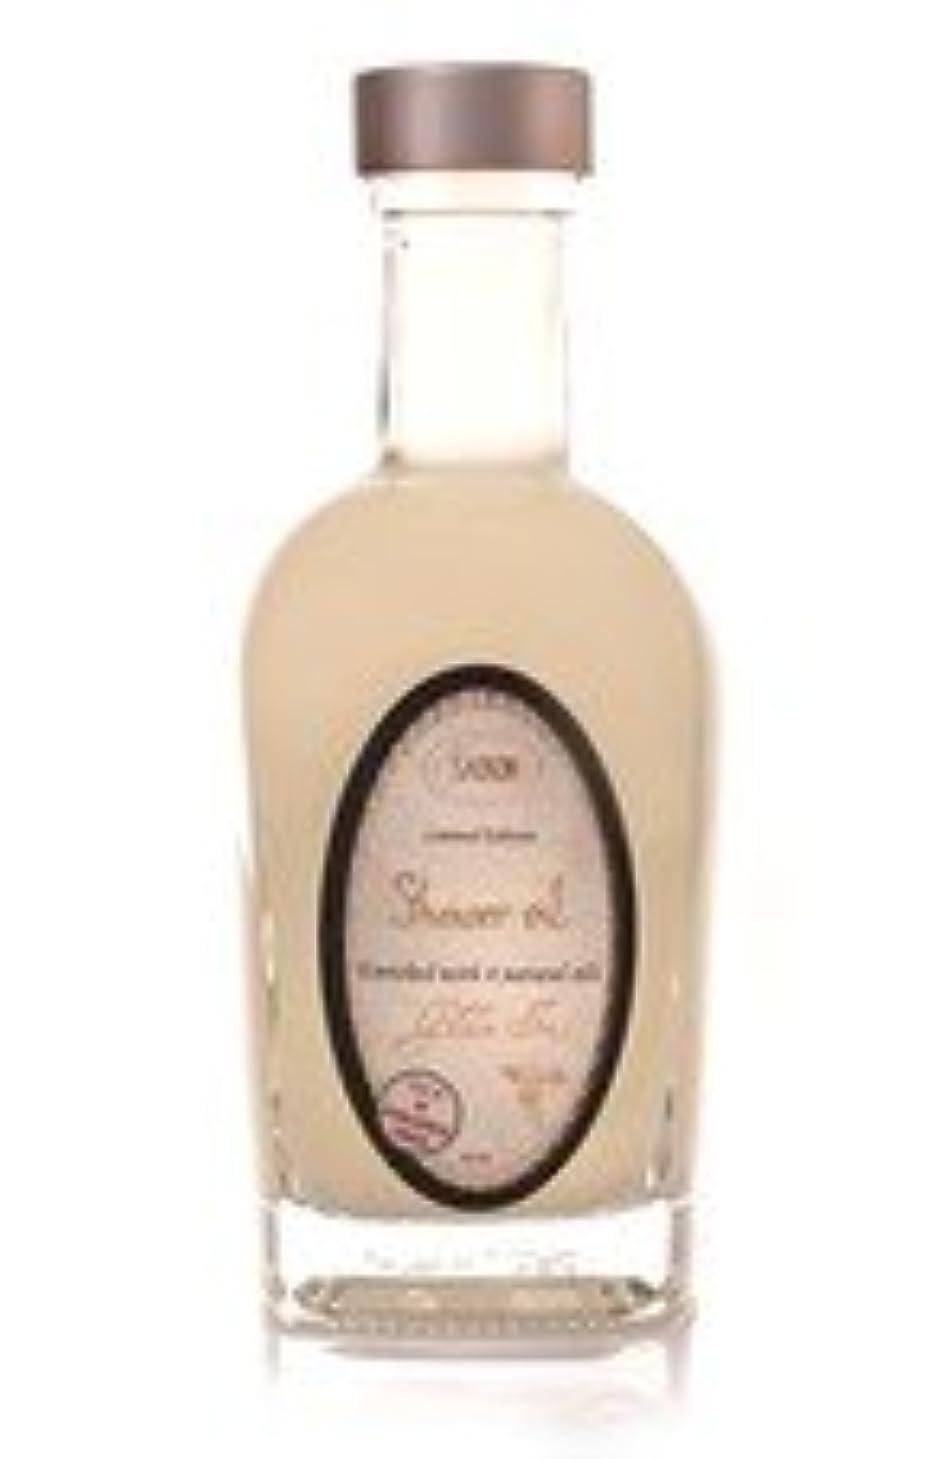 SABON Shower Oil サボン シャワーオイル 250ml 【Golden Iris ゴールデン アイリス】 イスラエル発 並行輸入品 海外直送